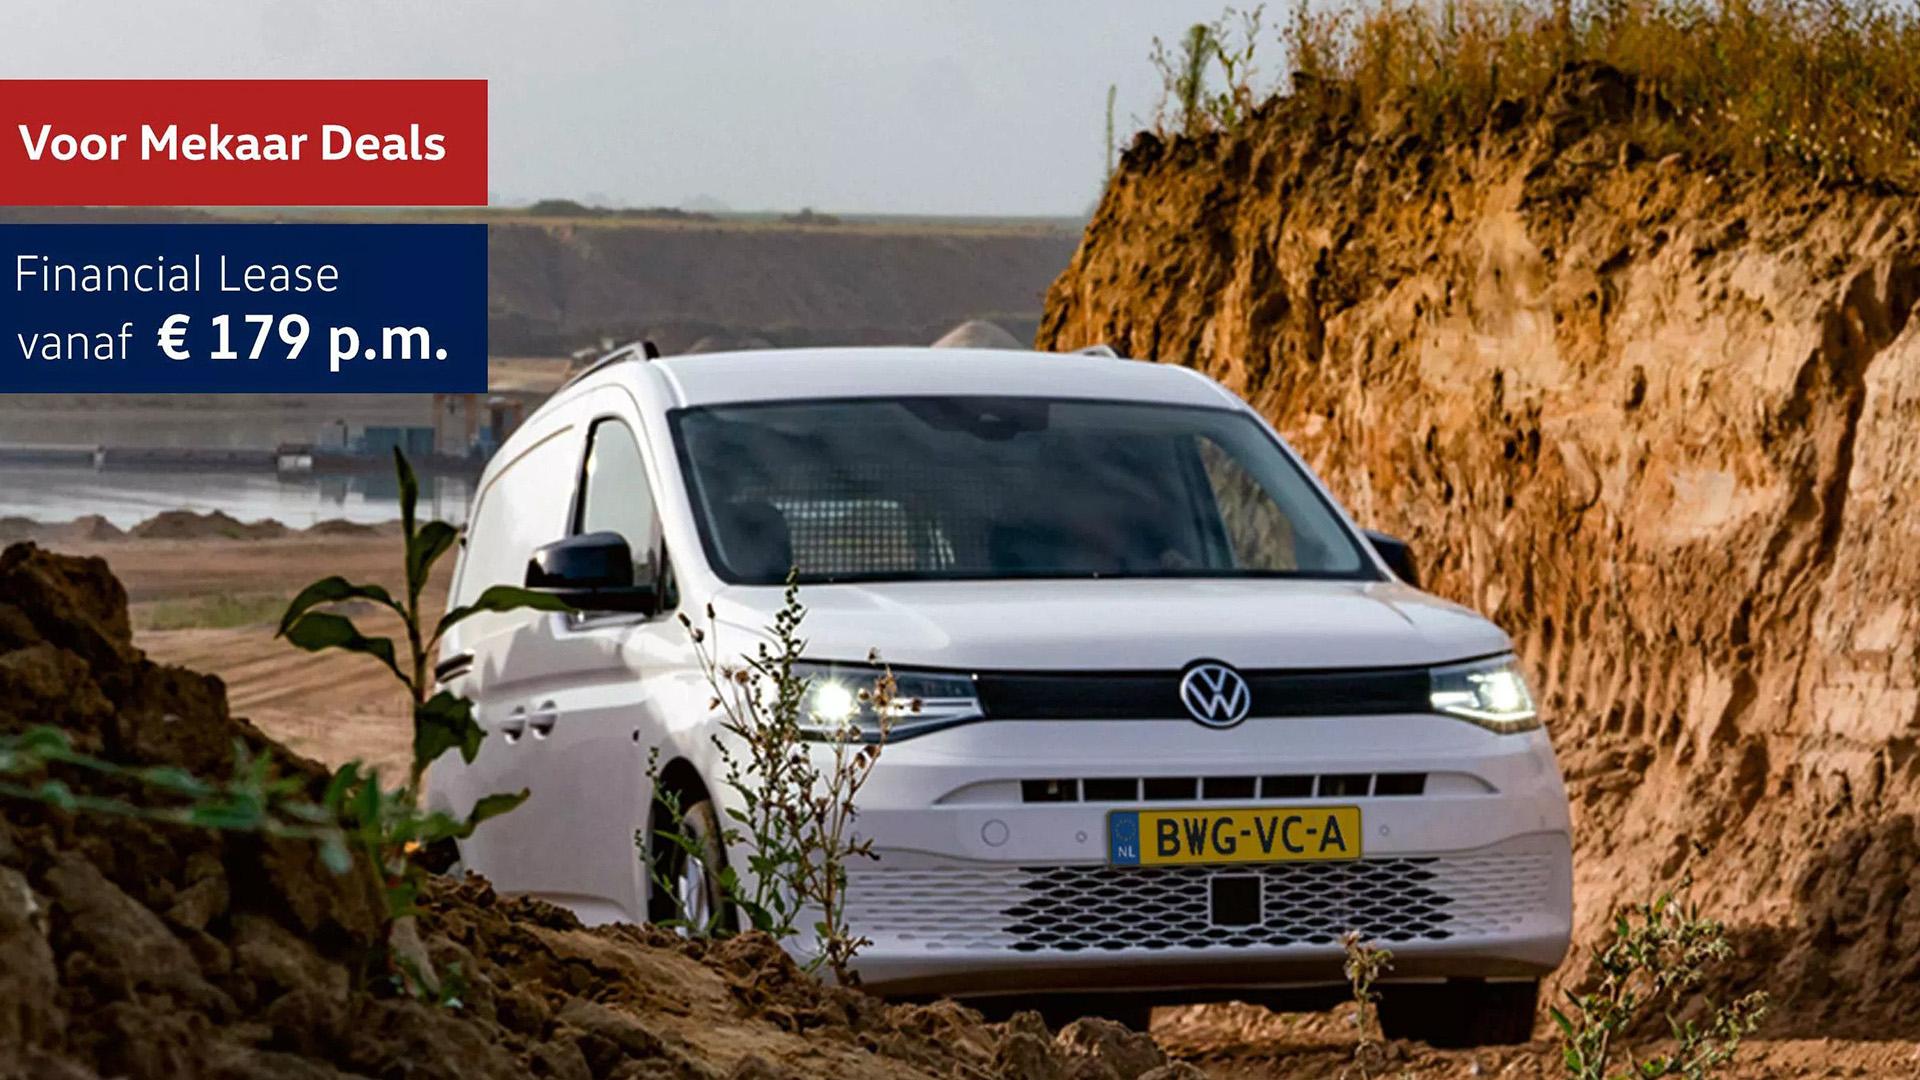 Volkswagen_Caddy_Cargo_Financial_Lease_-_IMG.jpg